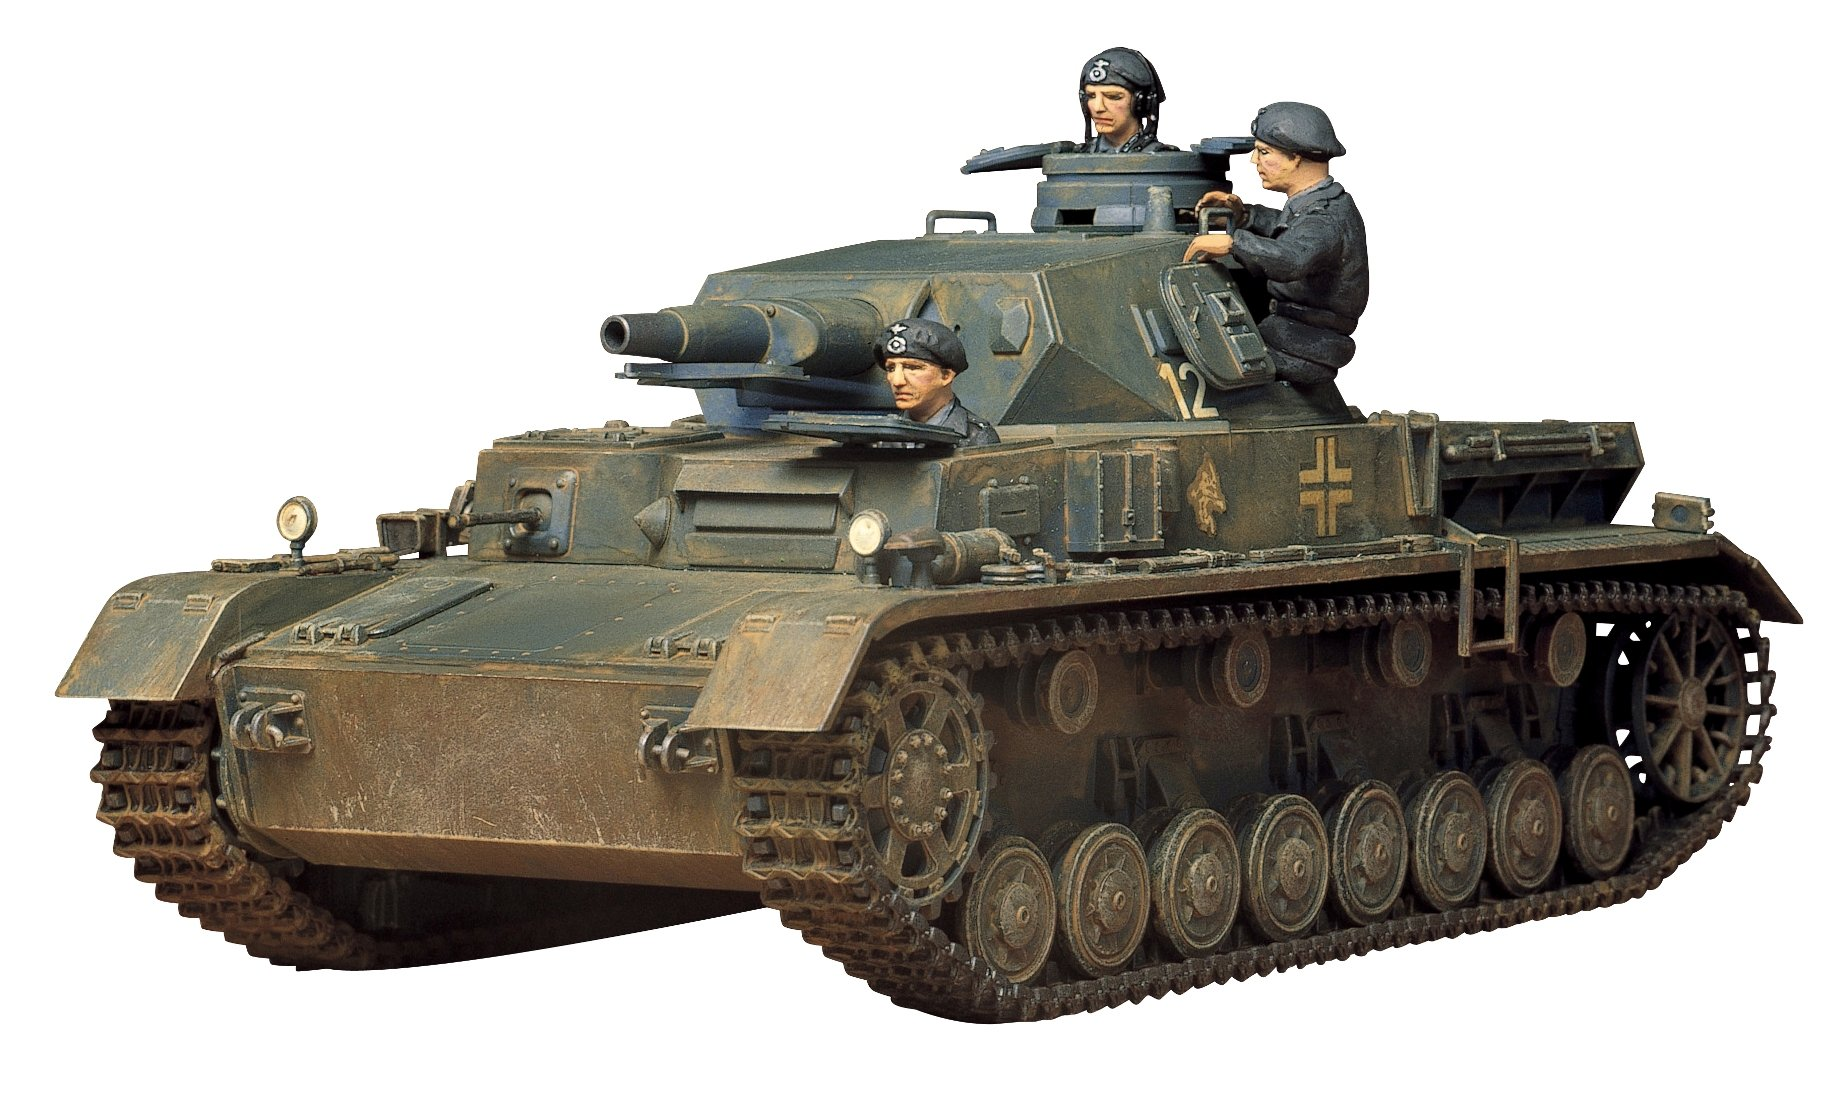 Tamiya America, Inc 1/35 German Panzer IV Ausf.D, TAM35096 1